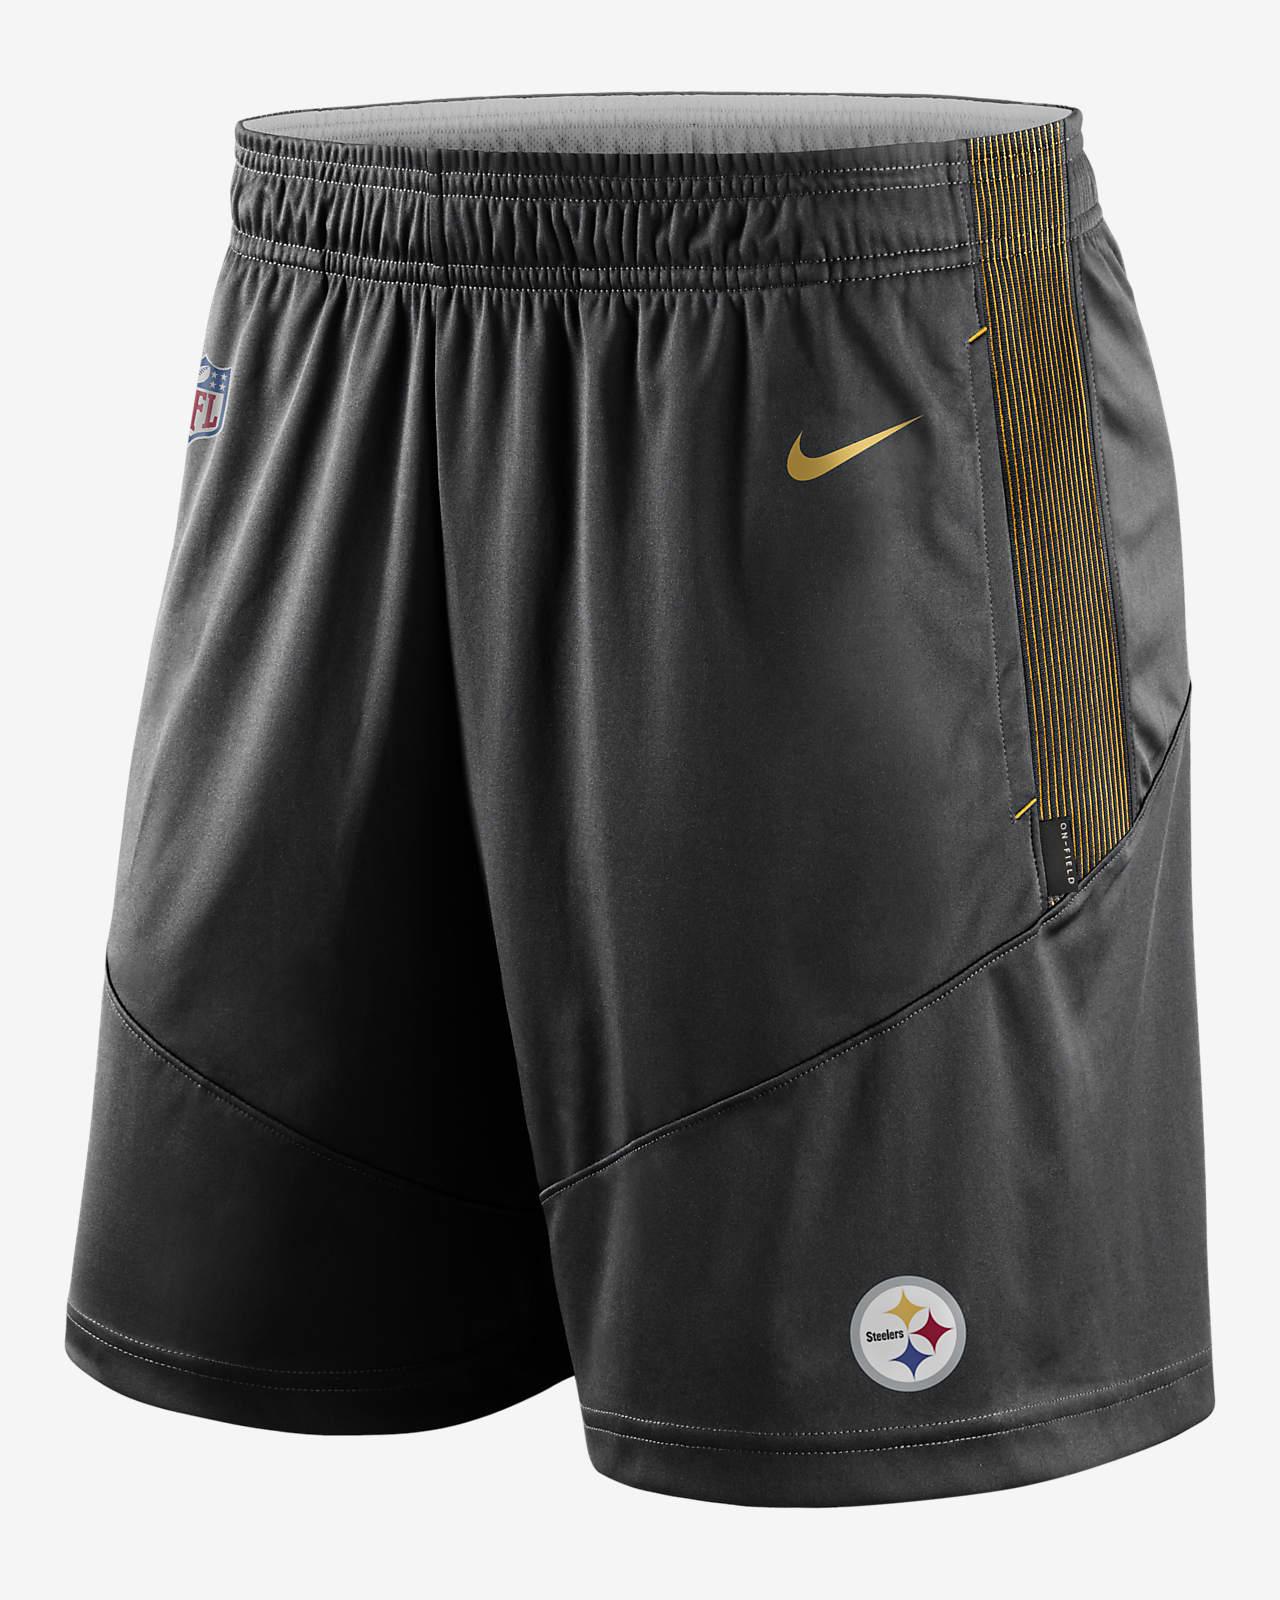 Nike Dri-FIT Sideline (NFL Pittsburgh Steelers) Men's Shorts